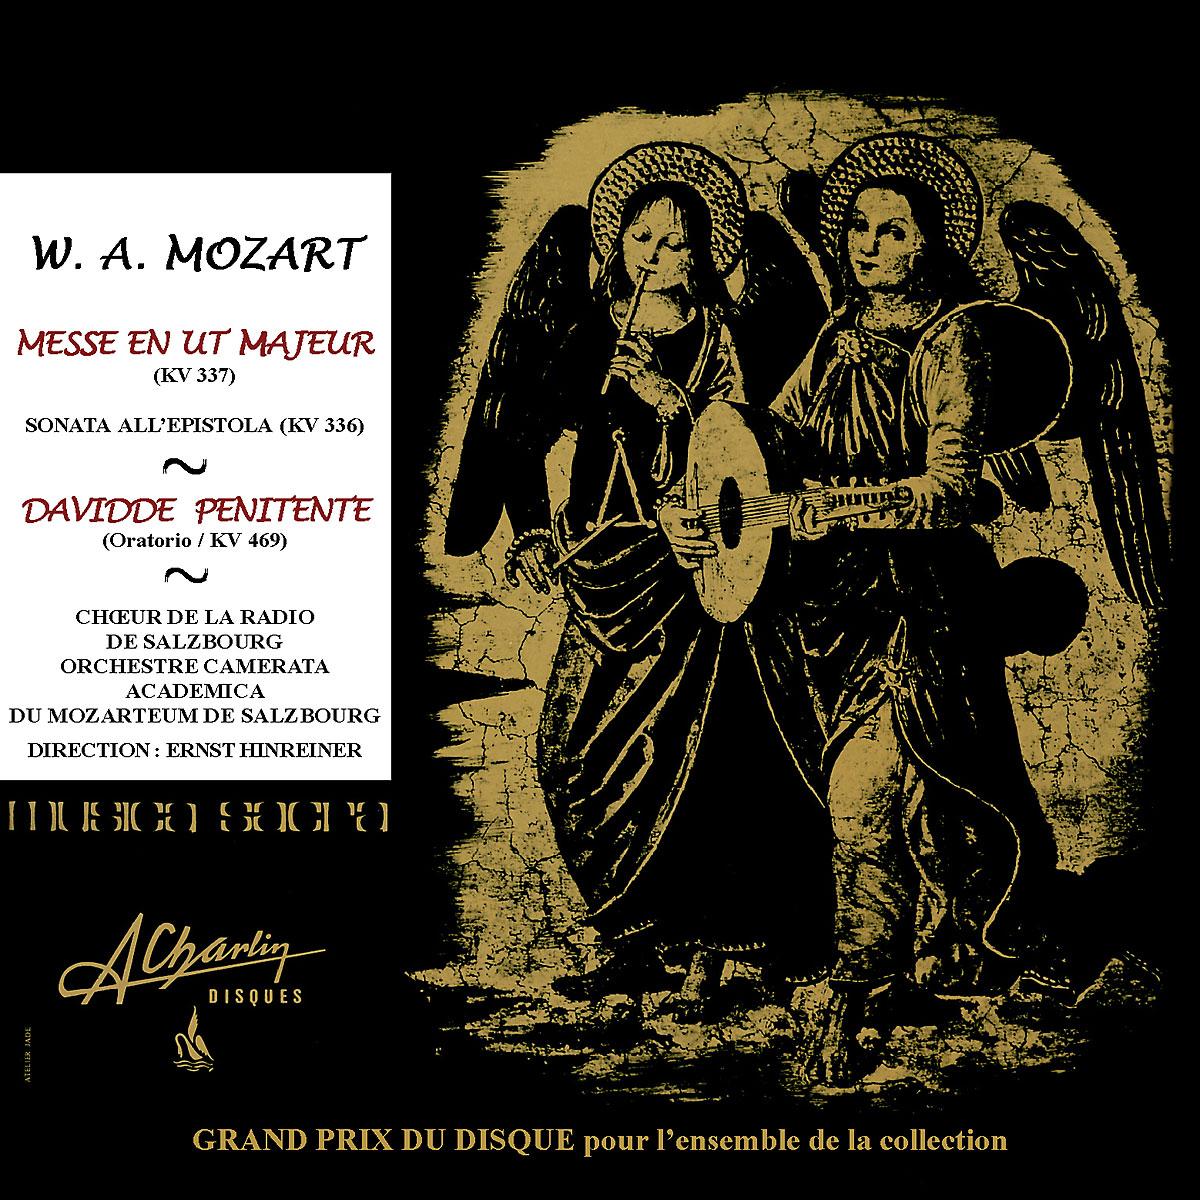 W. A. MOZART - AMS 65